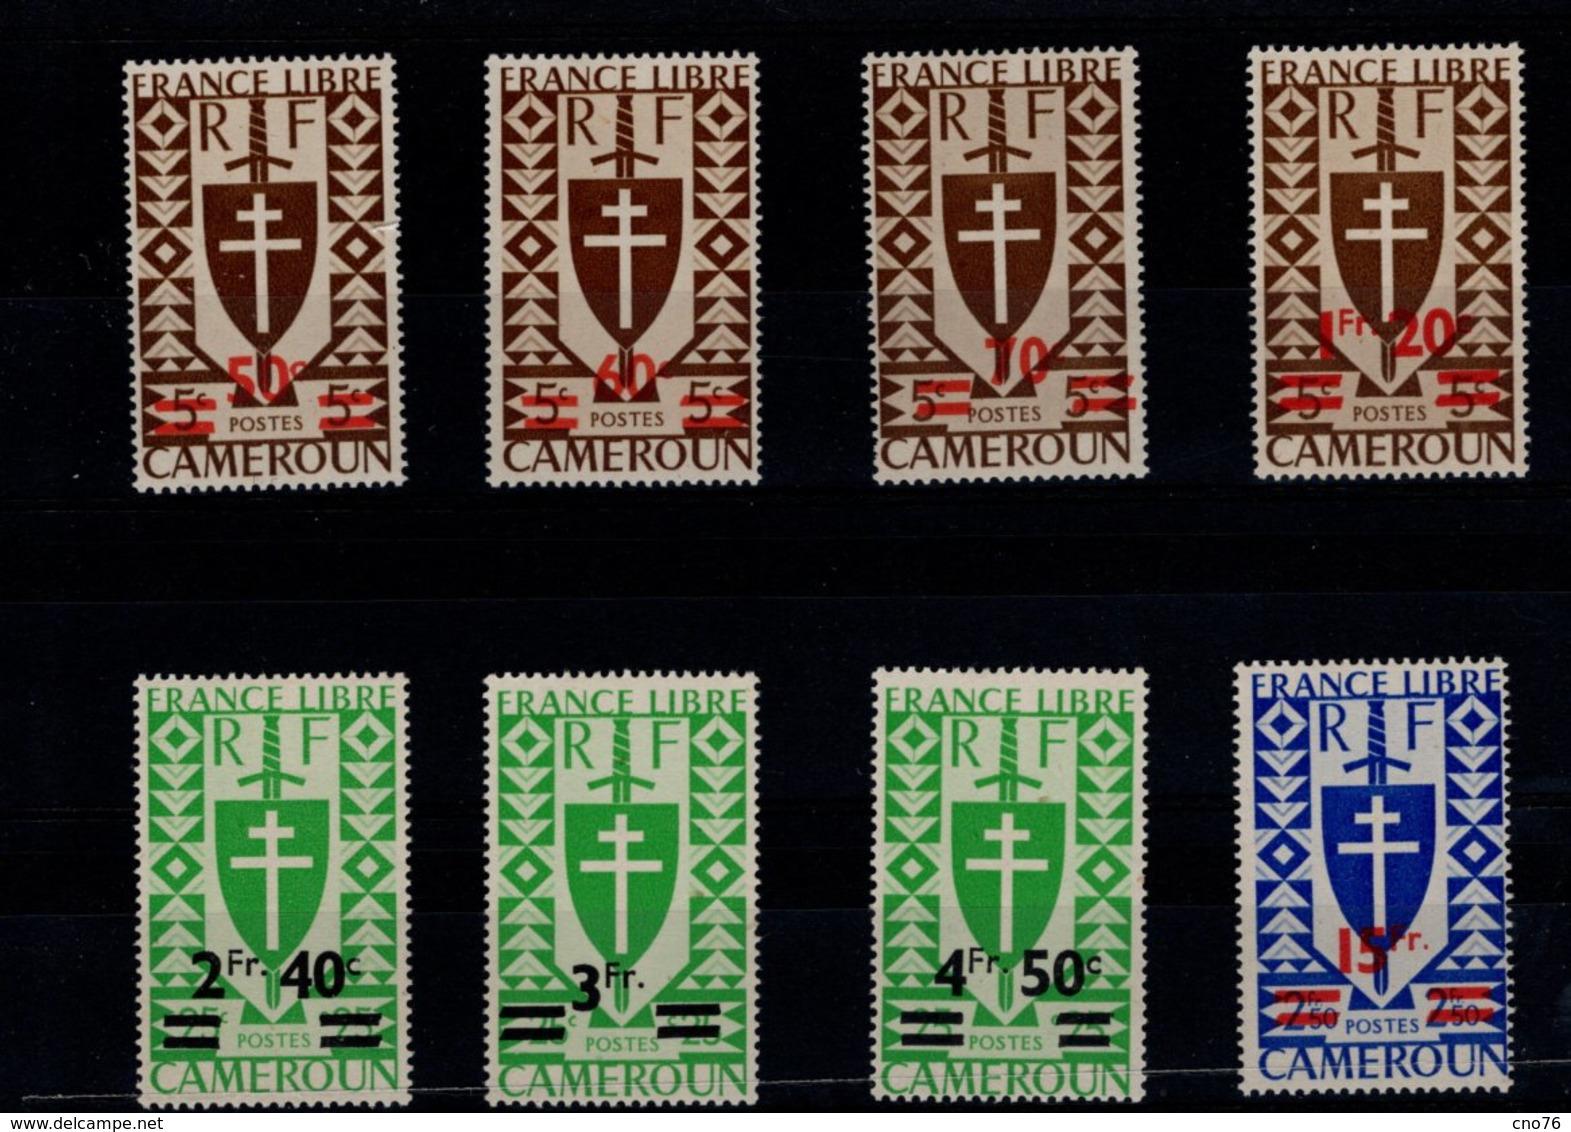 Cameroun 1945 N° 266 à 273 Timbres Neufs ** 8 Valeurs - Cameroun (1915-1959)